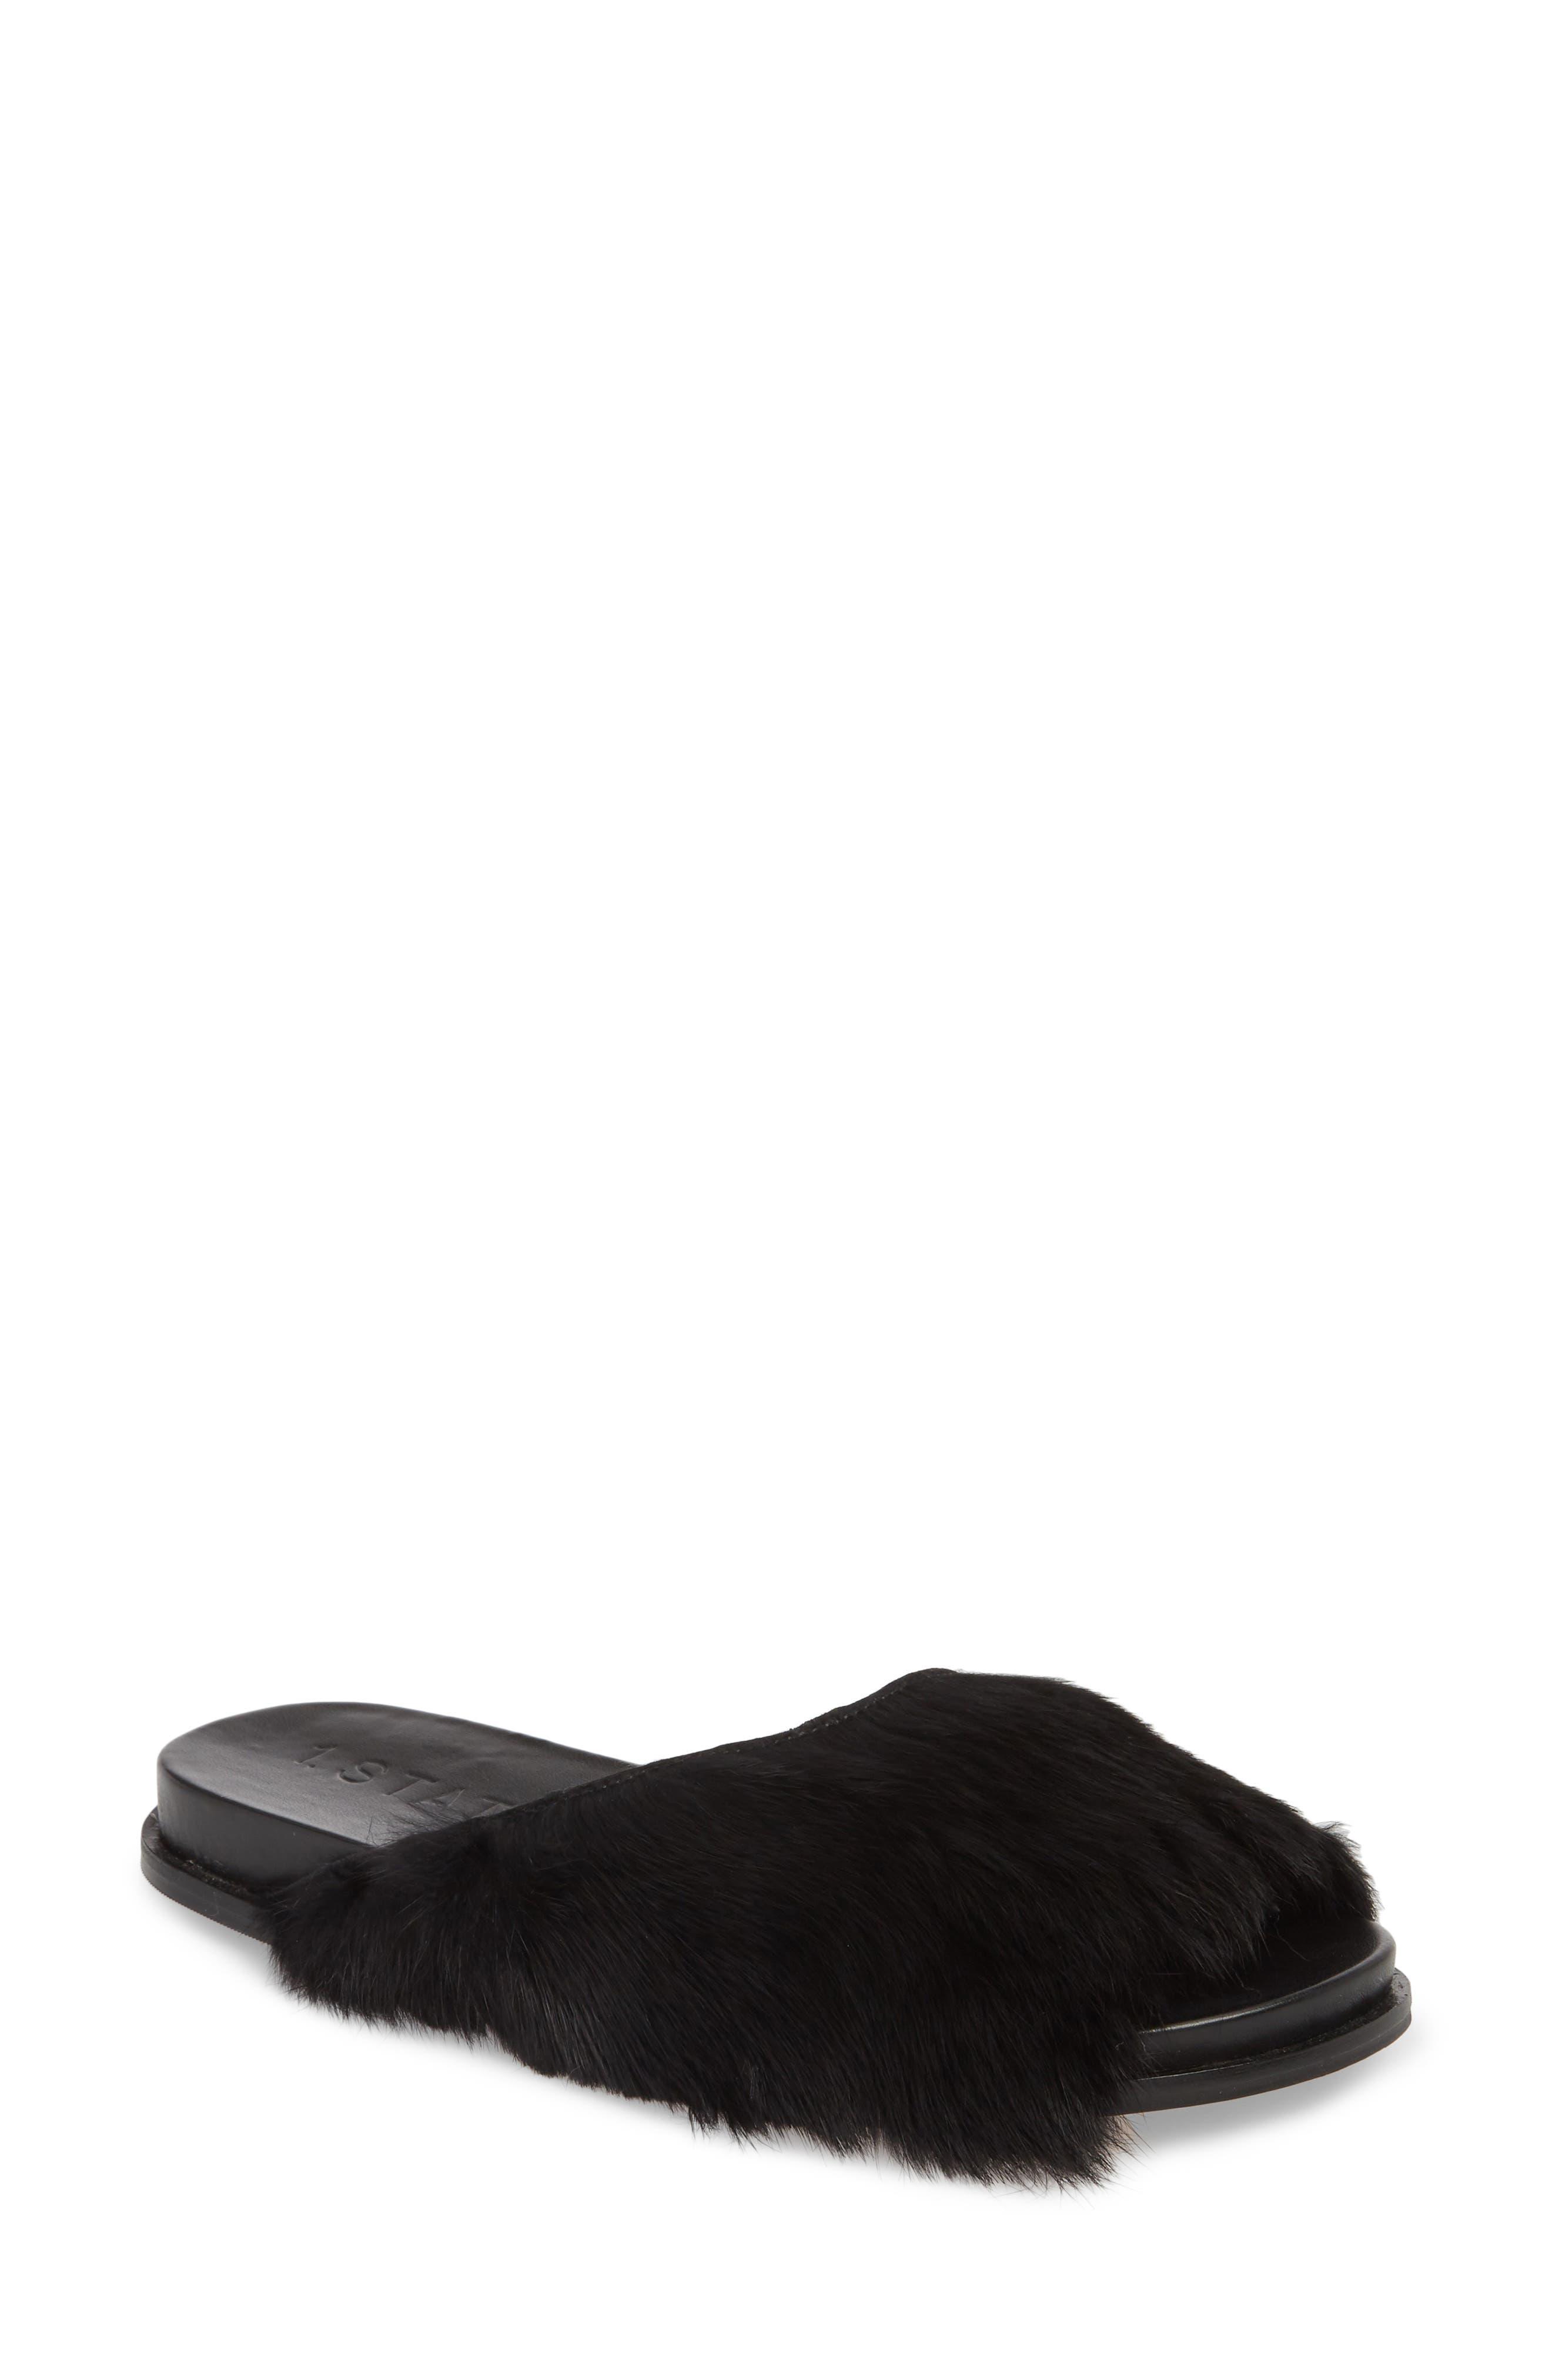 Onora Slide Sandal,                             Main thumbnail 1, color,                             001